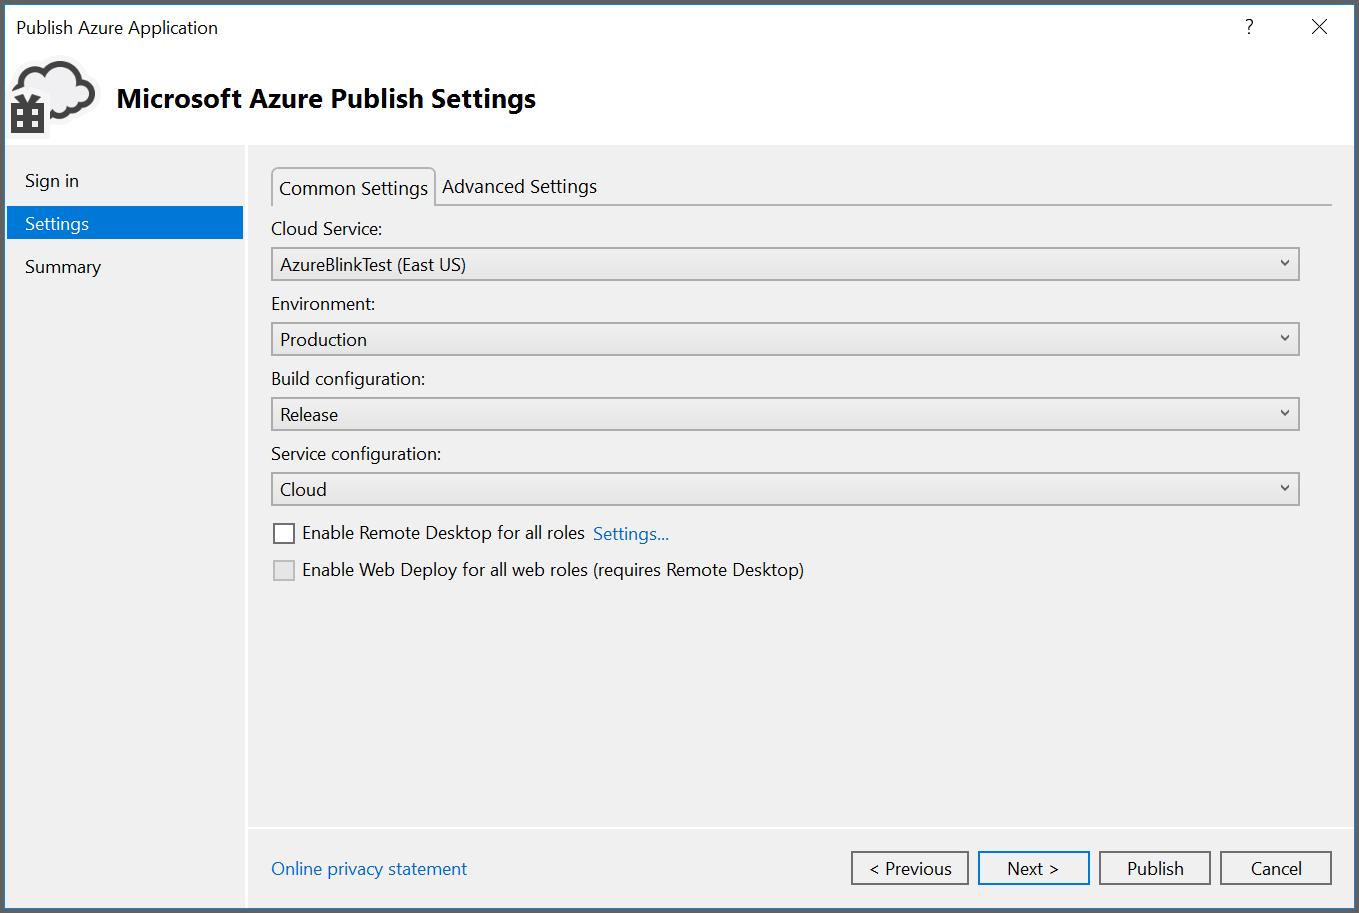 Provide azure settings and publish it.